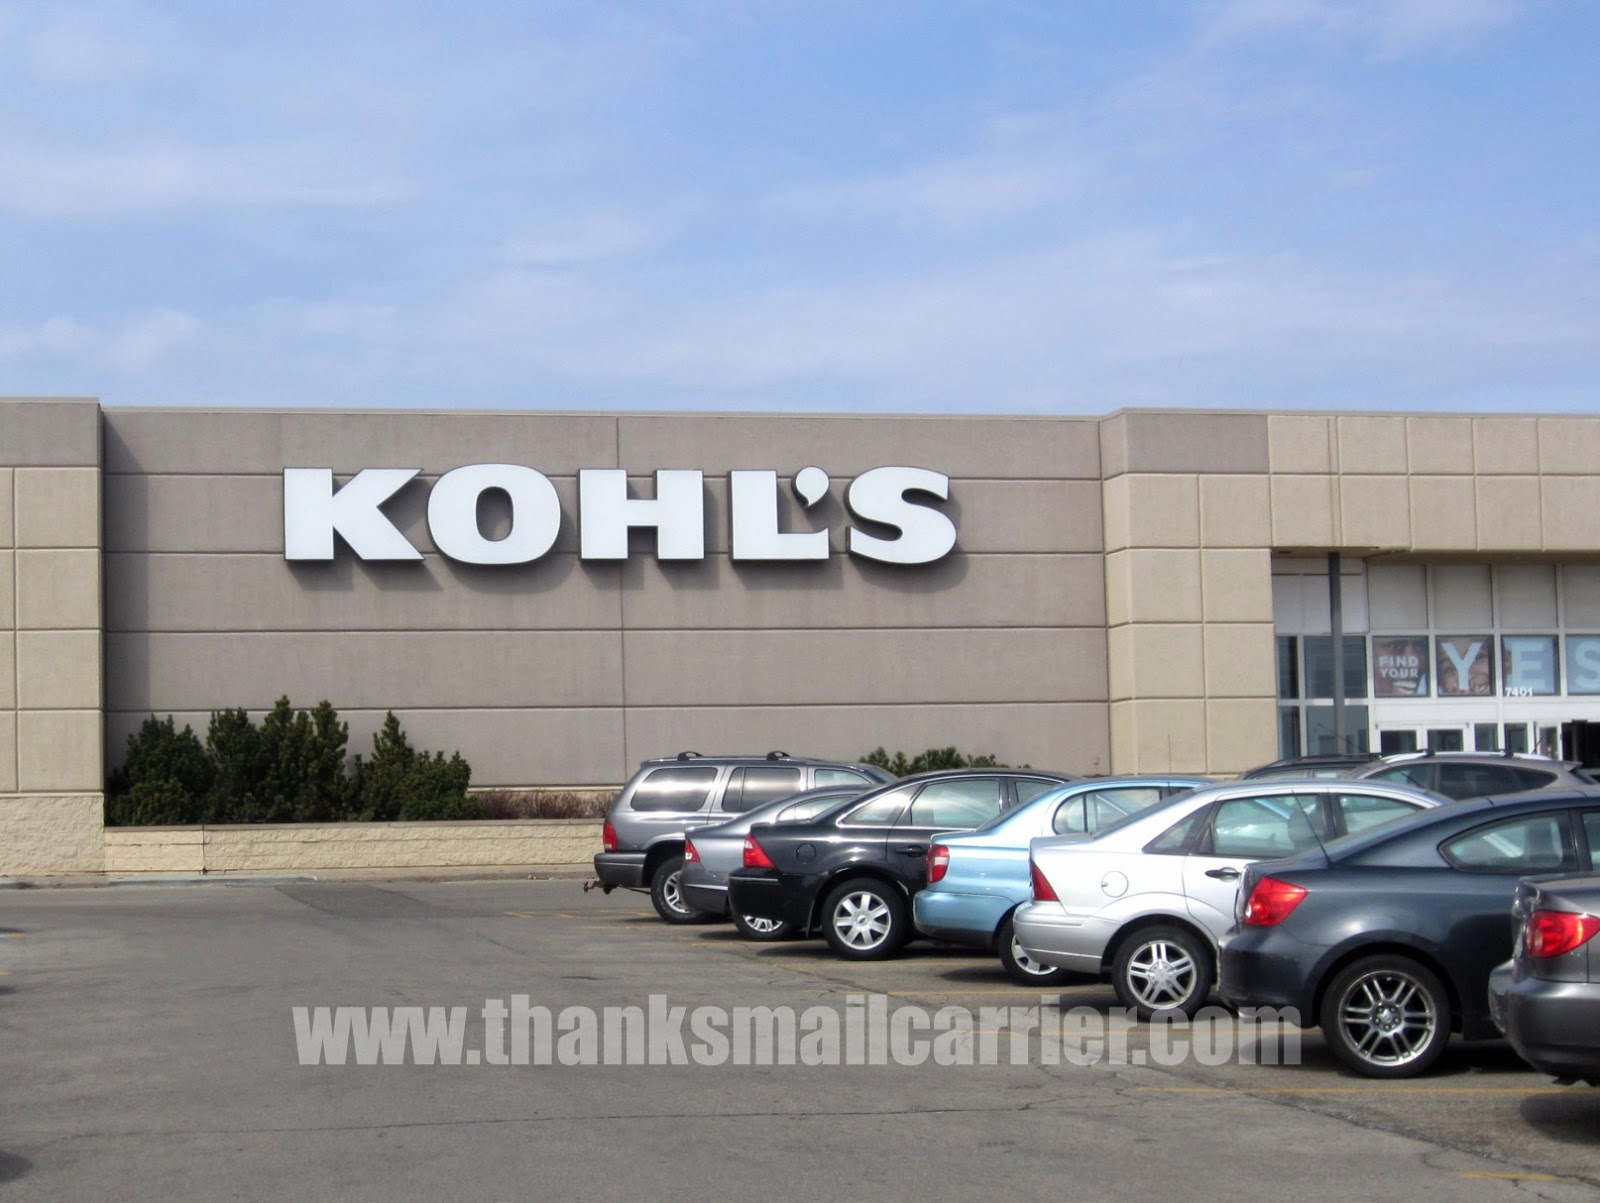 Kohl's stores